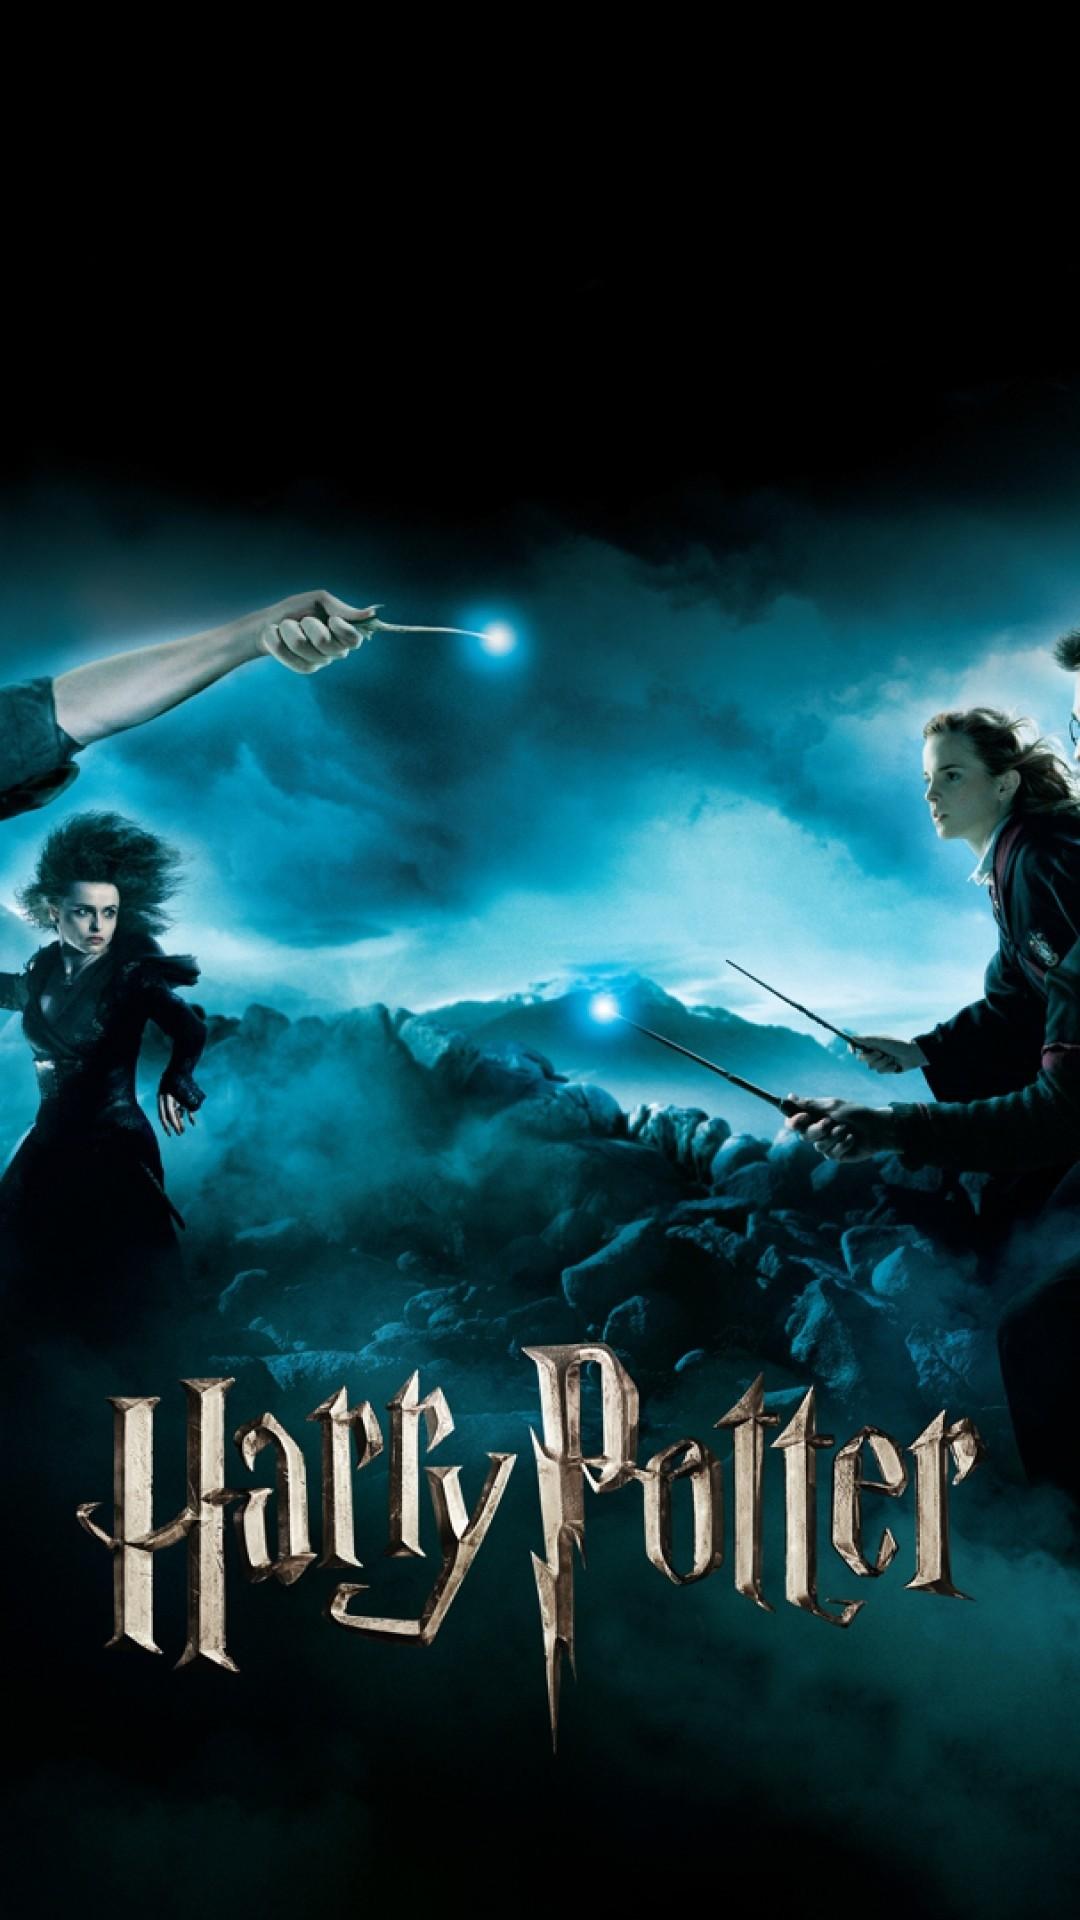 … Harry Potter Wallpaper Iphone harry potter iphone wallpaper4